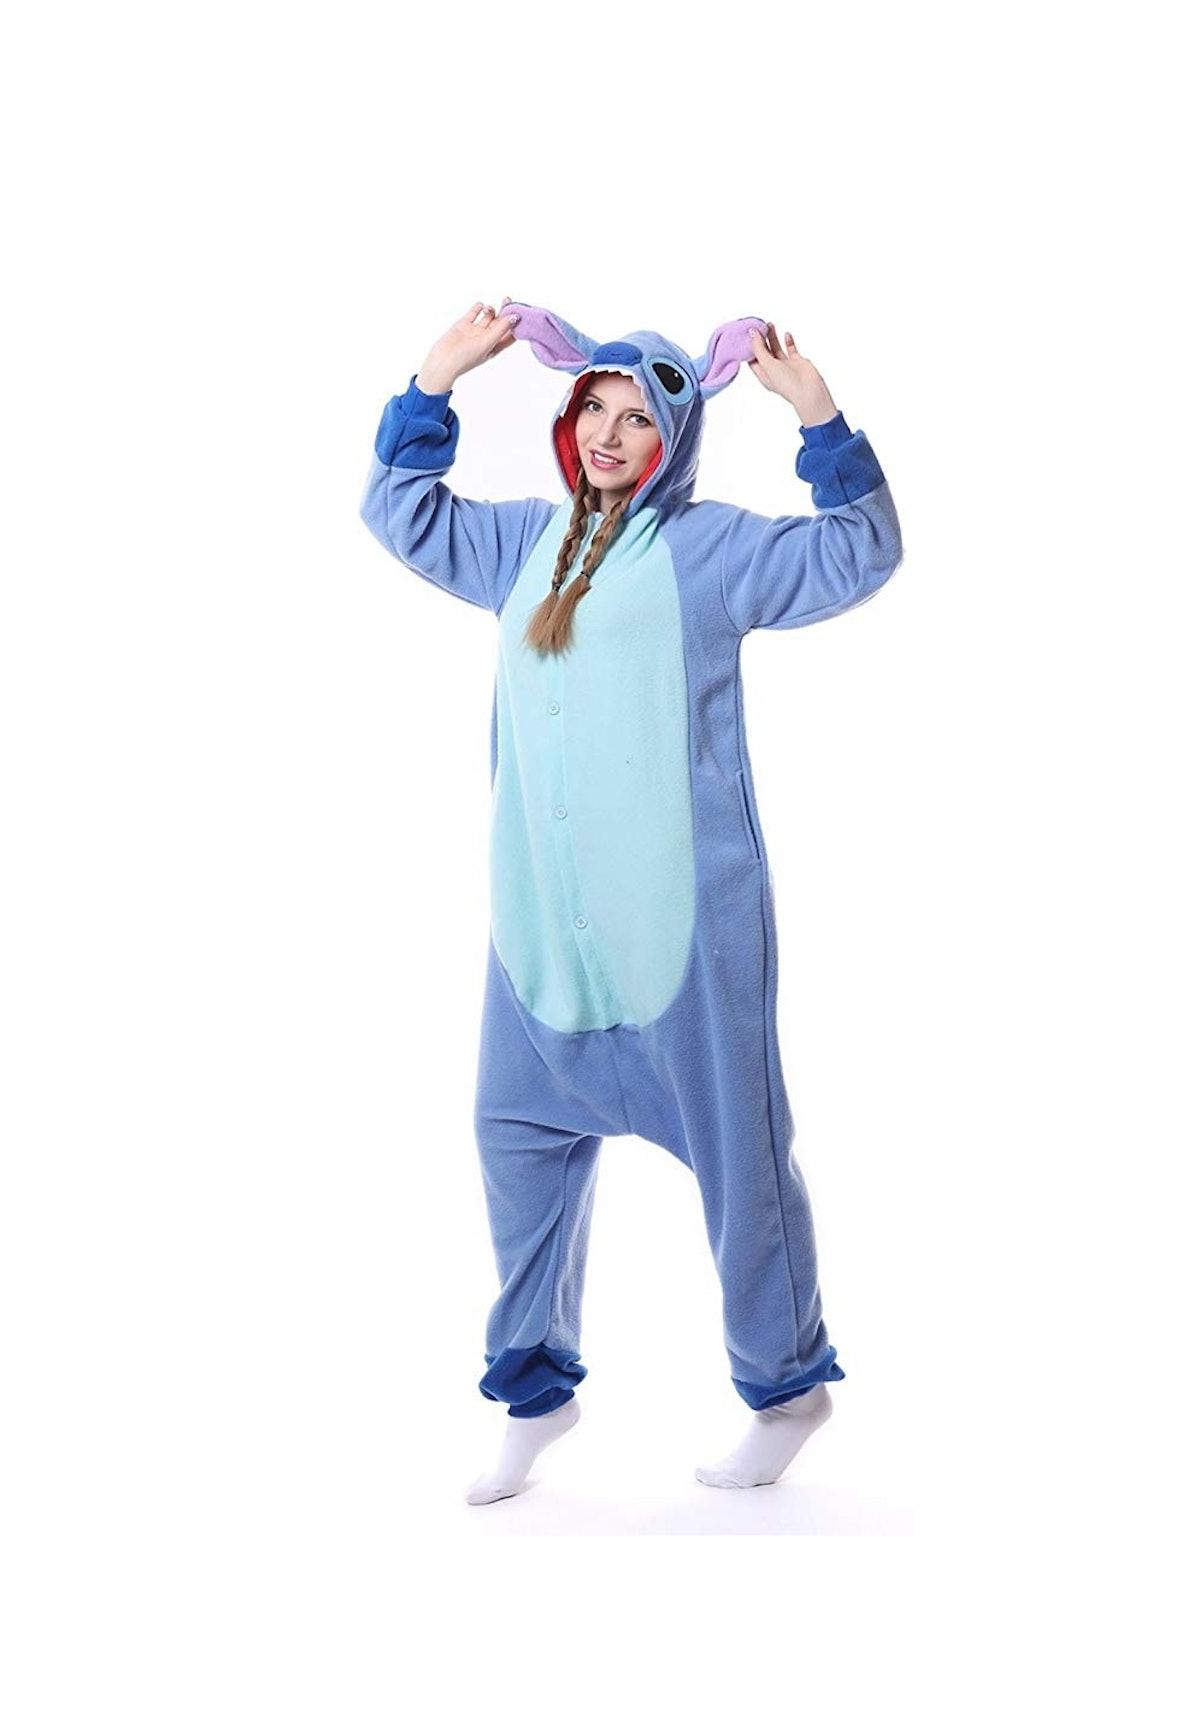 Unisex-Adult Onesie Pajamas Stitch Animal Sleepwear for Halloween Party